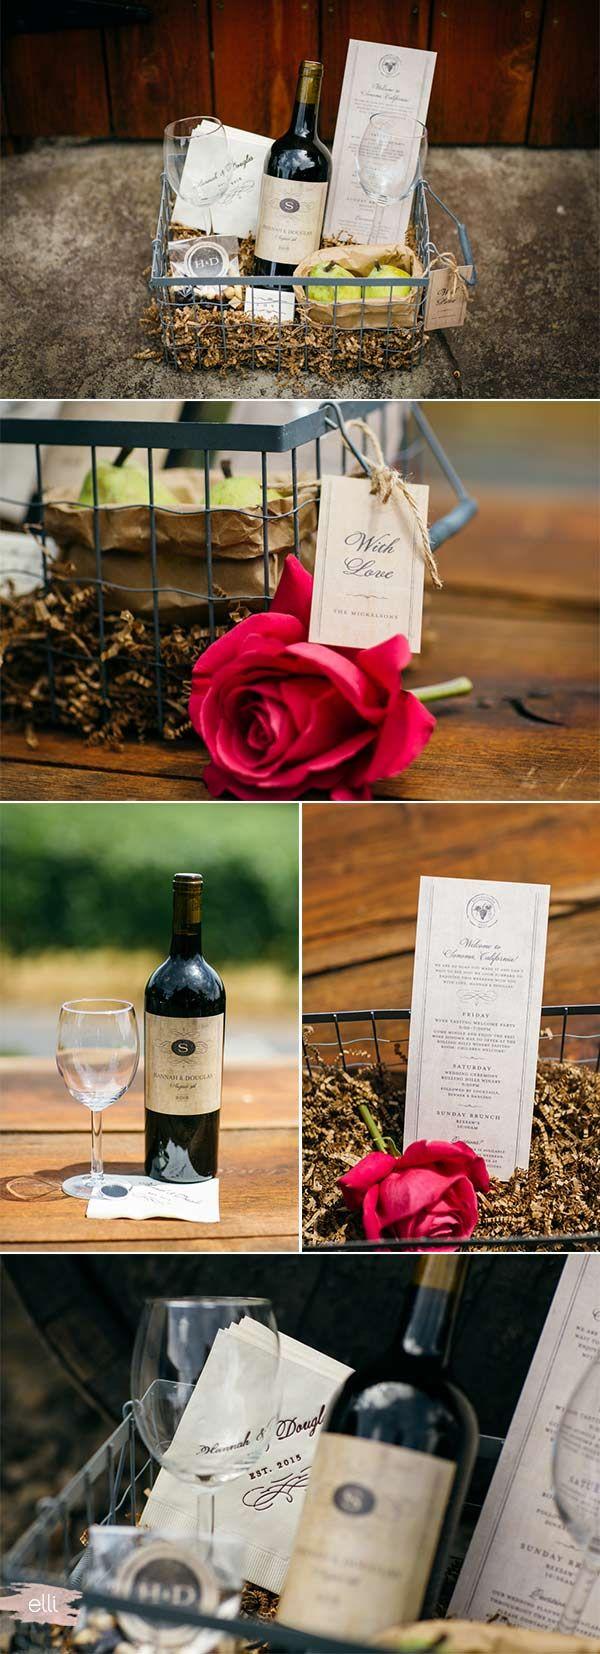 DIY Wedding Welcome Basket | Gifts | Pinterest | DIY wedding ...